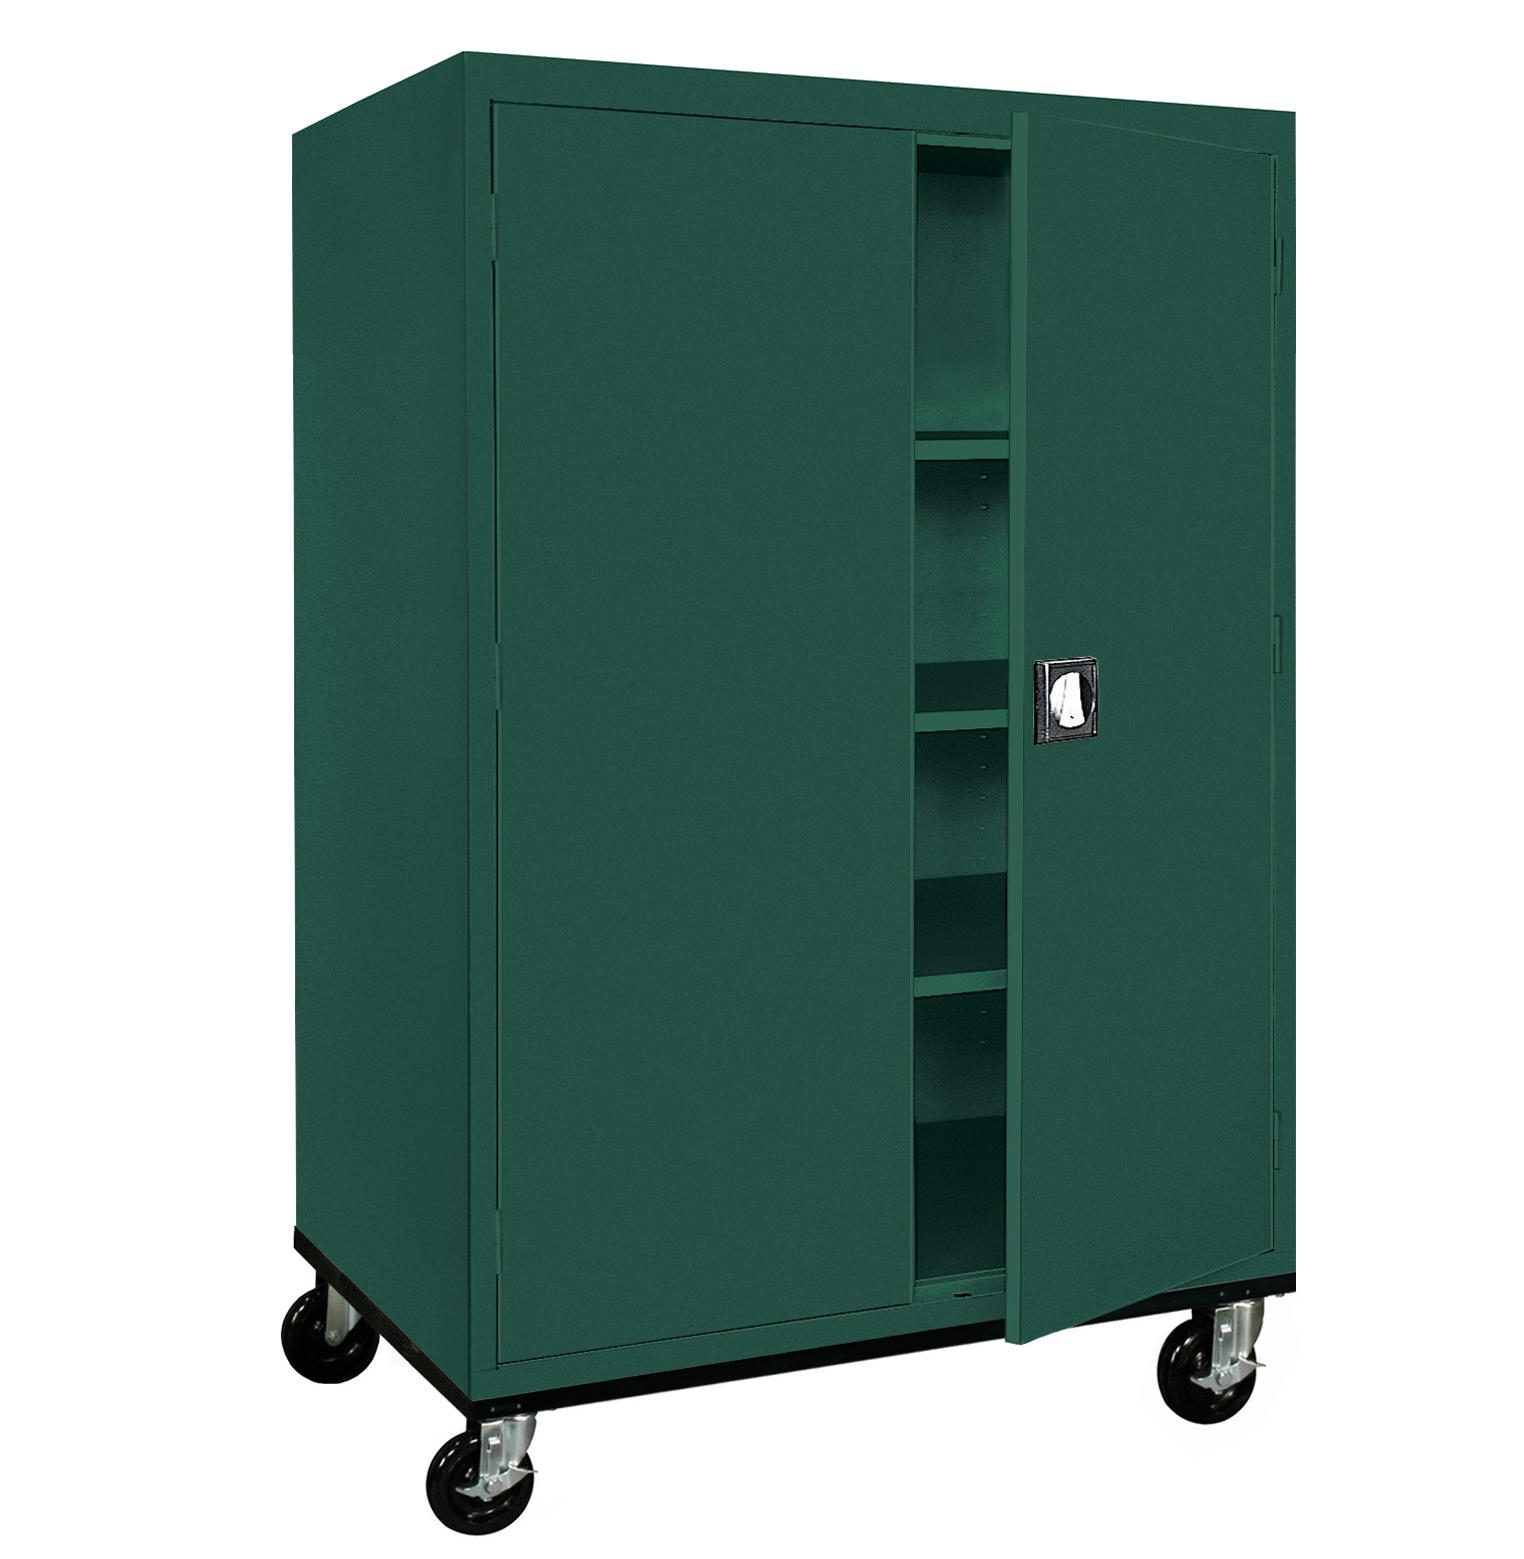 Portable Storage Cabinets : Mobile storage cabinet jmjs inc dba coe distributing